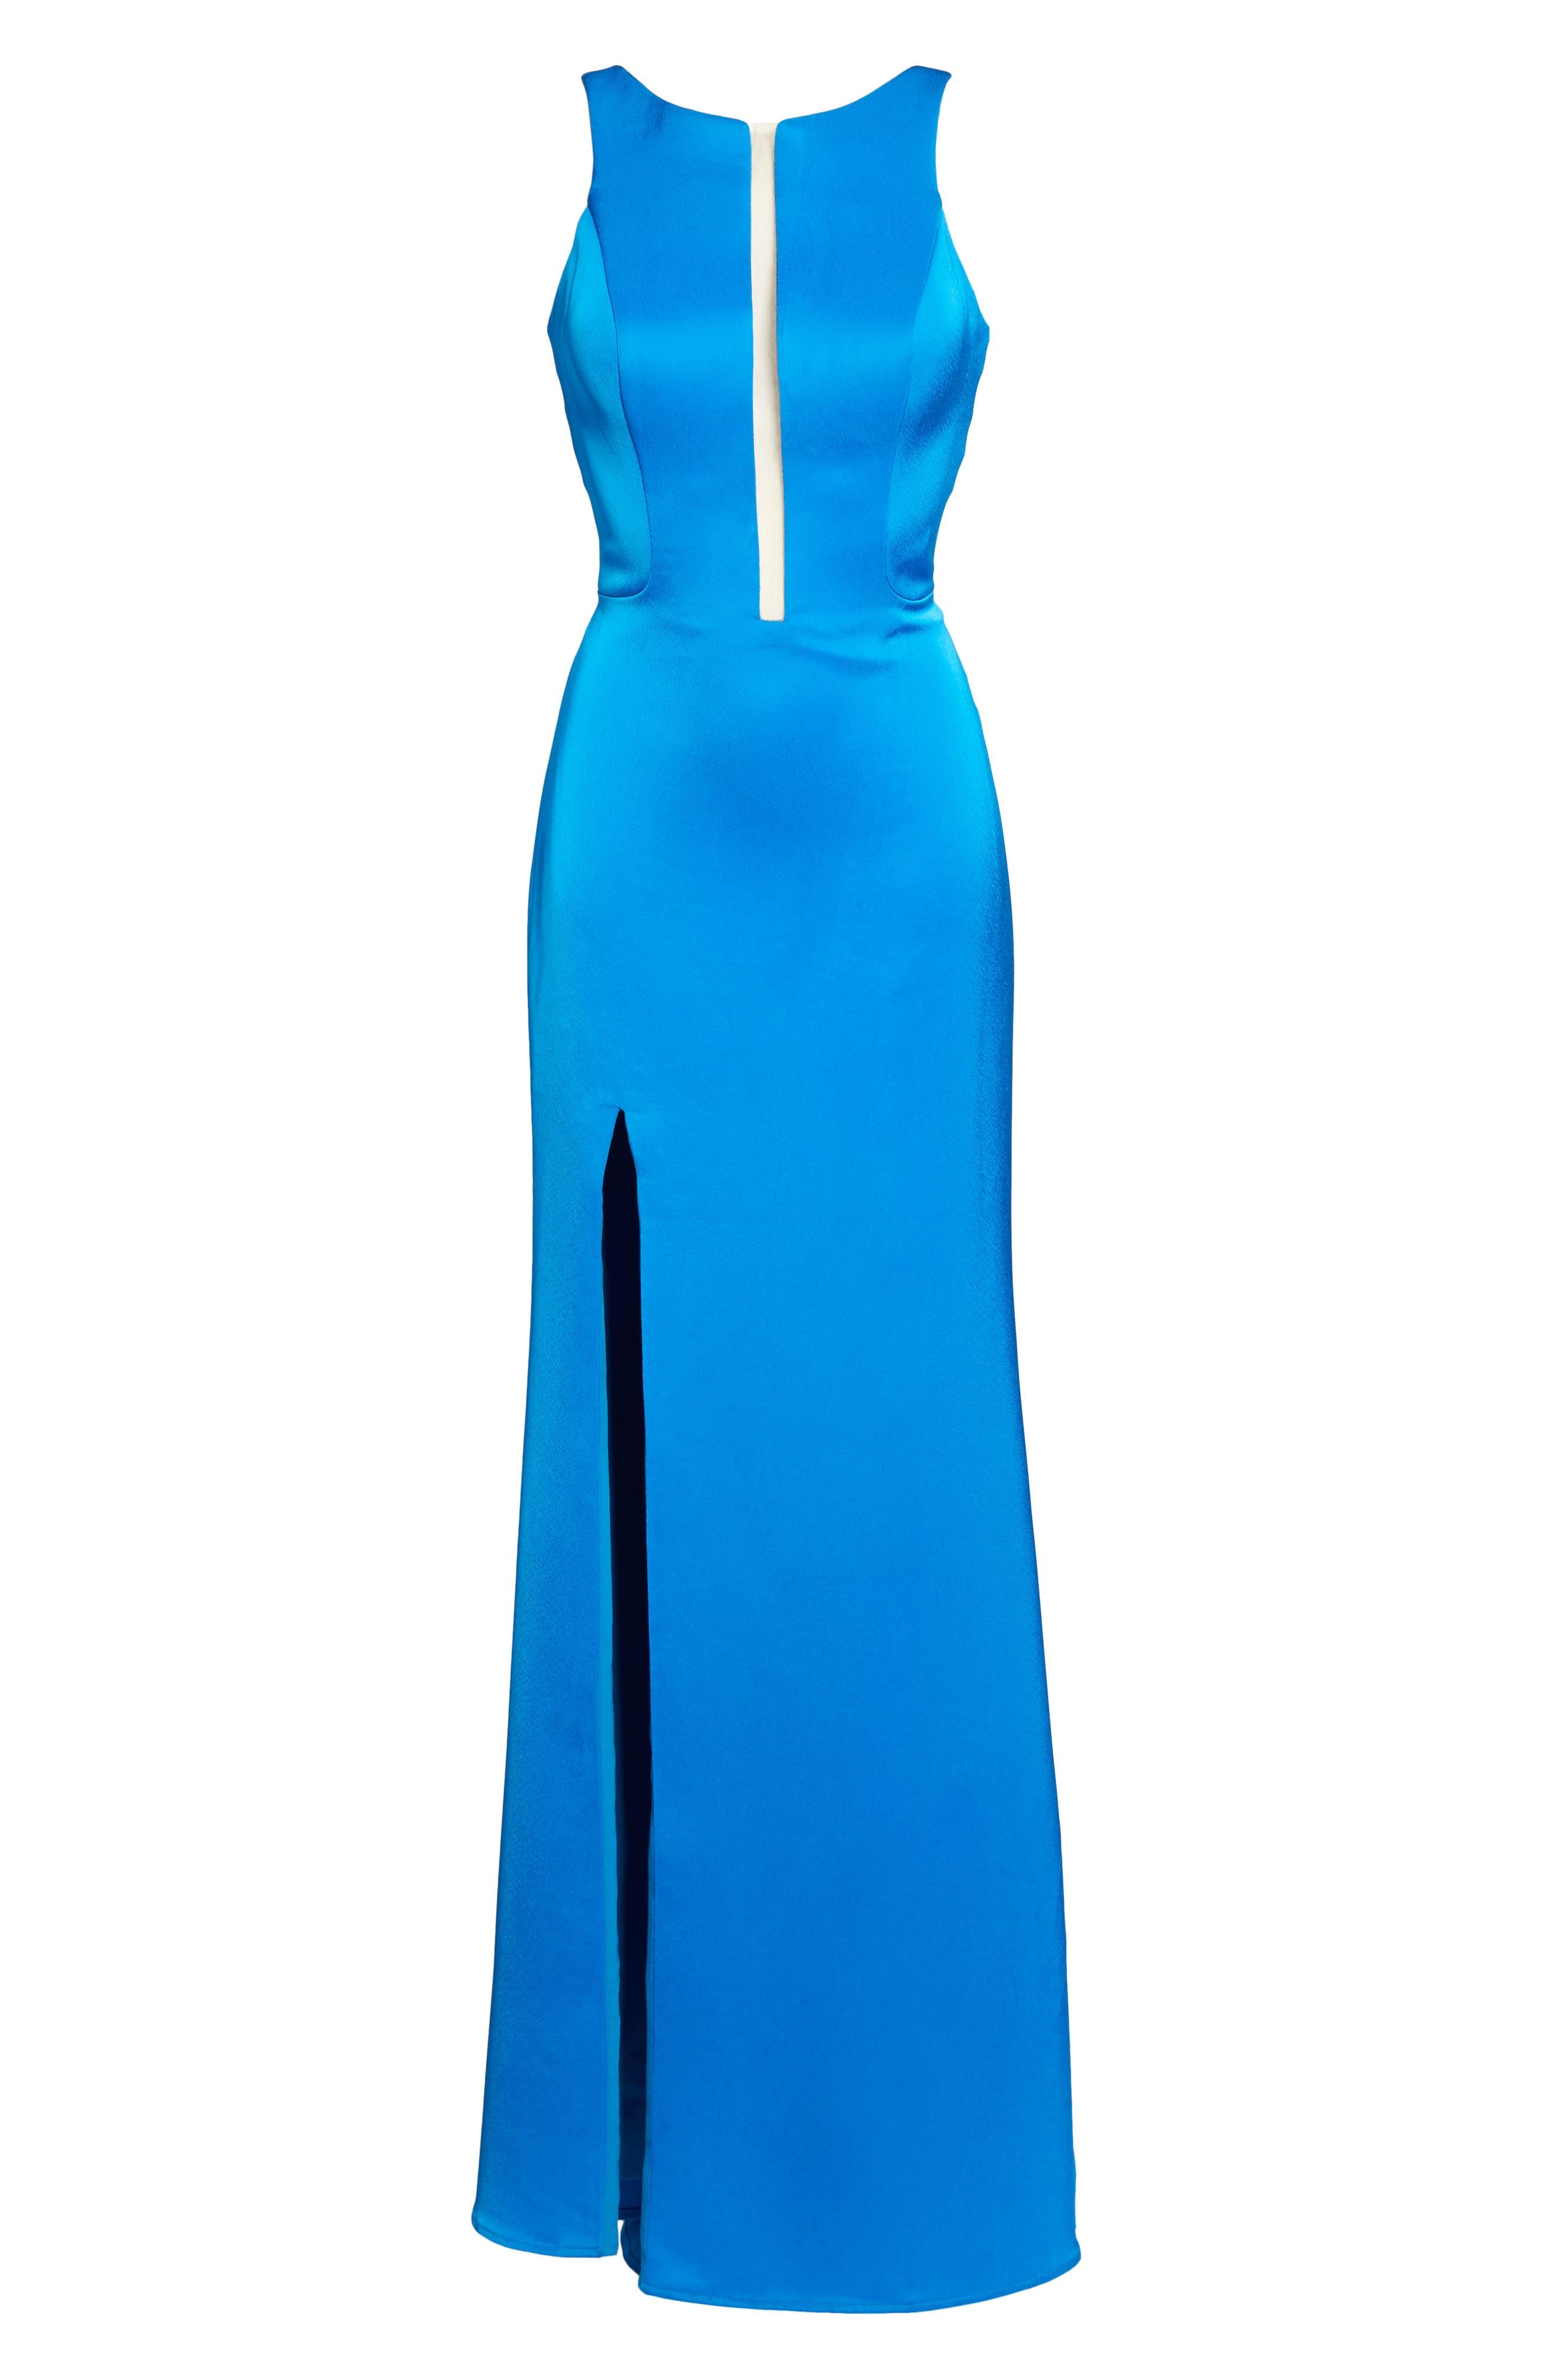 Cage Back Satin Gown,                             Alternate thumbnail 6, color,                             Ocean Blue